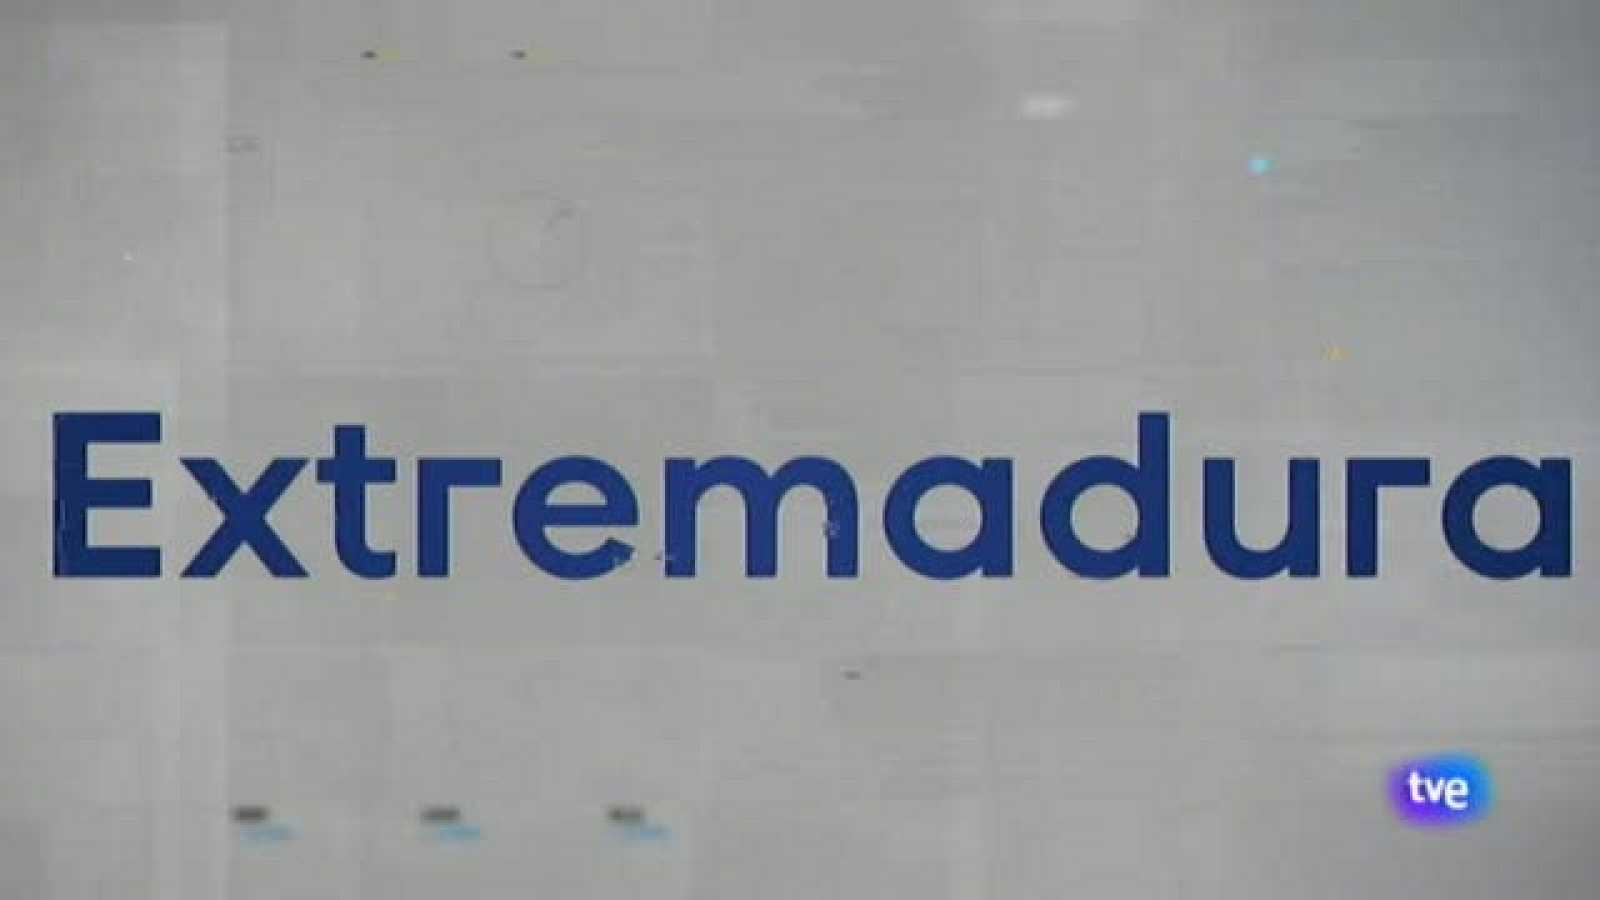 Noticias de Extremadura - 13/04/2021